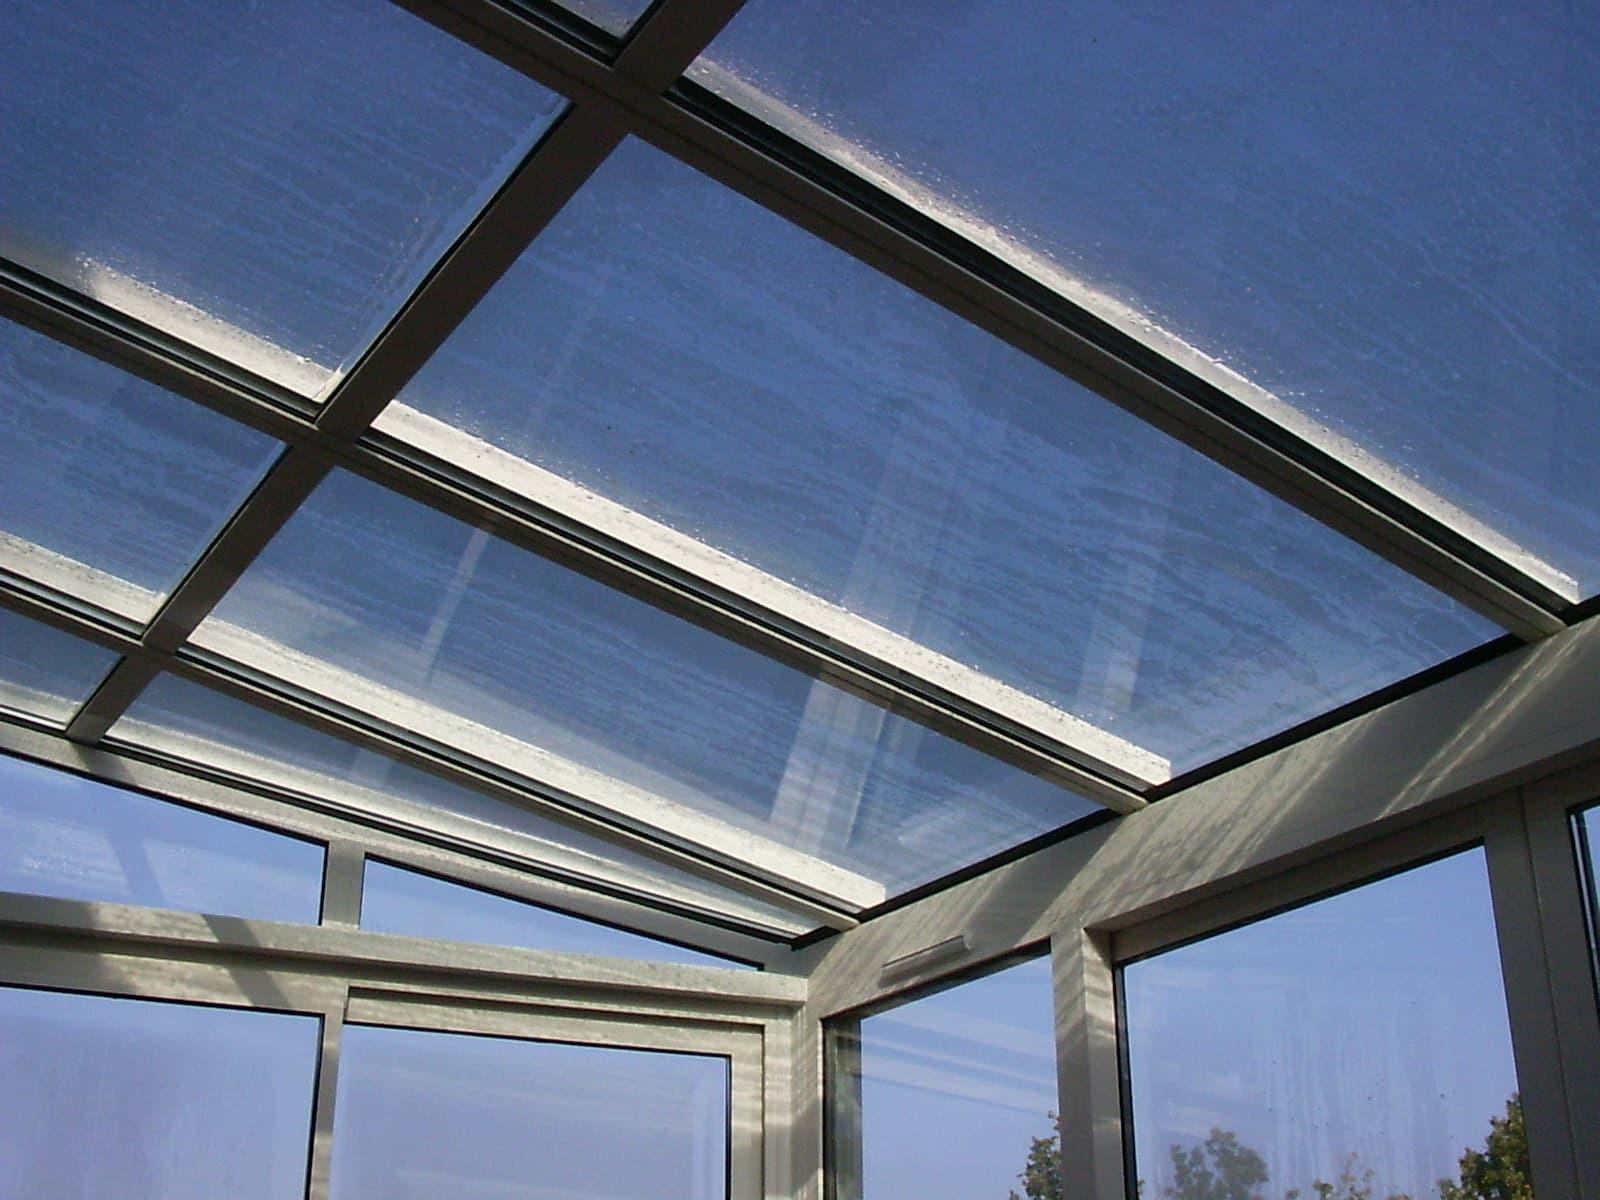 Véranda Alu Toiture vitrée Aluminium